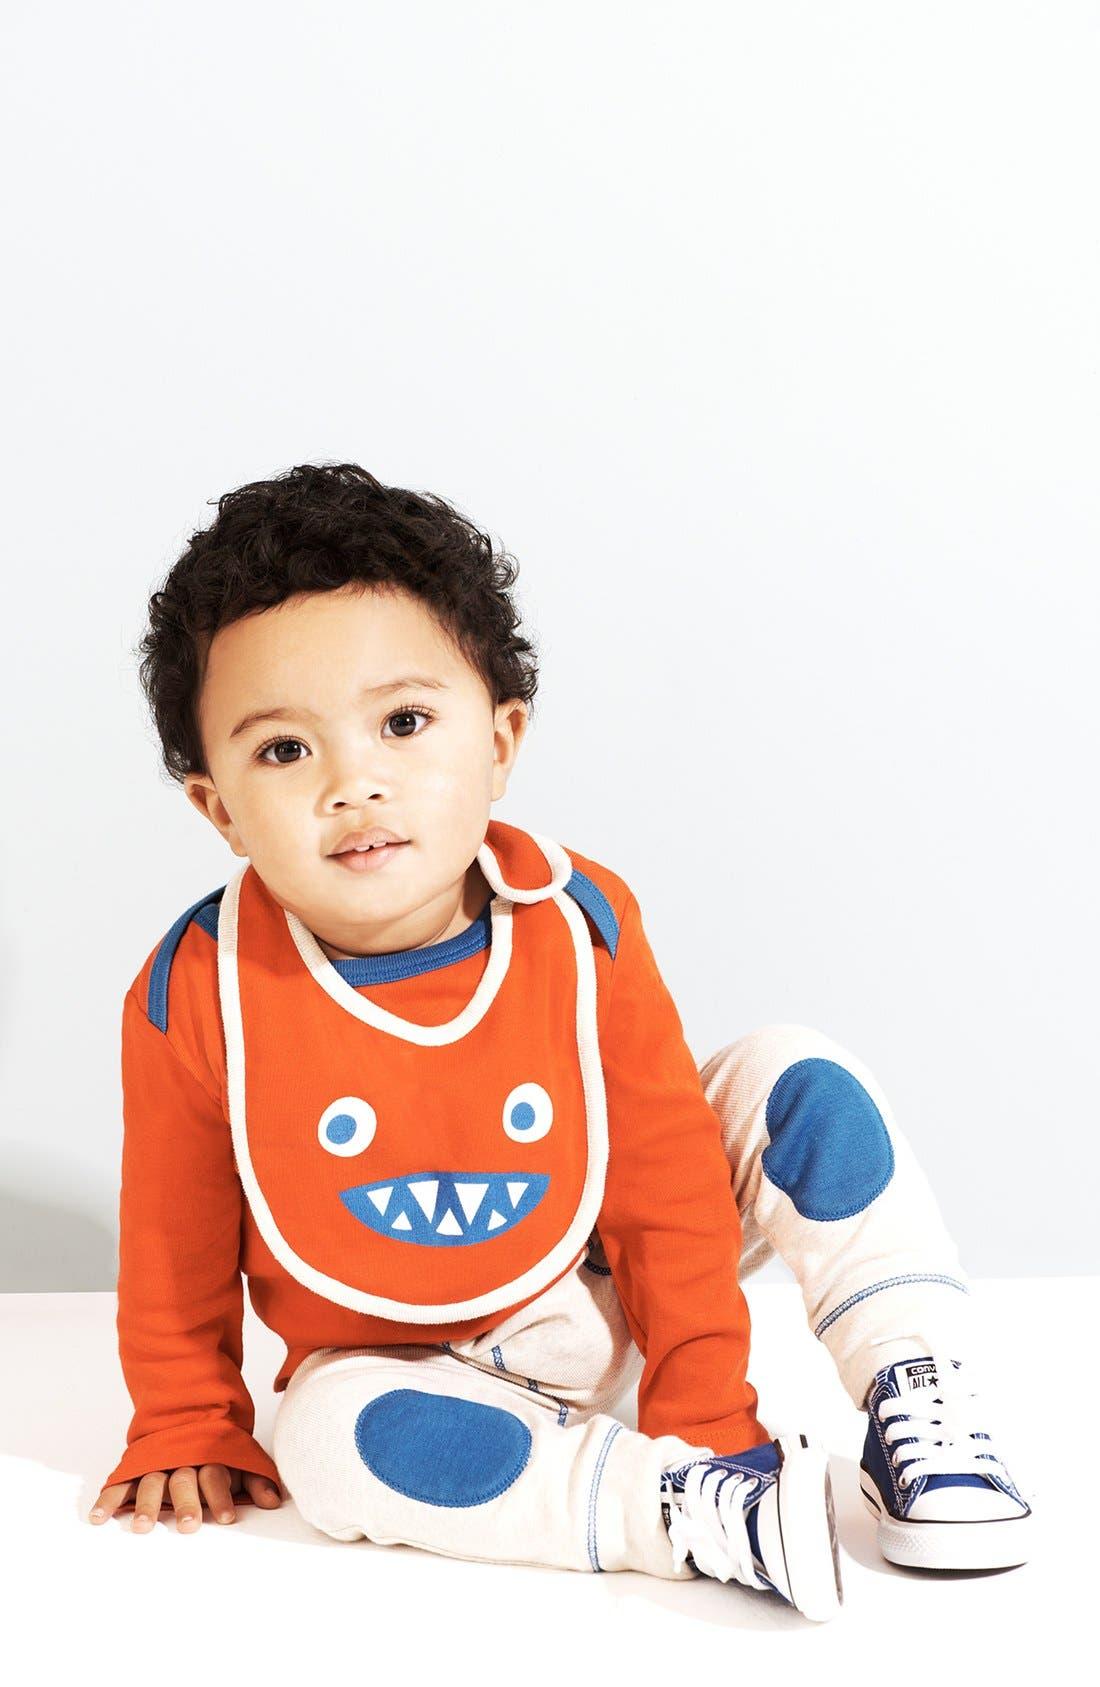 Main Image - Stem Baby Cotton Shirt, Pants & Bib (Baby Boys)